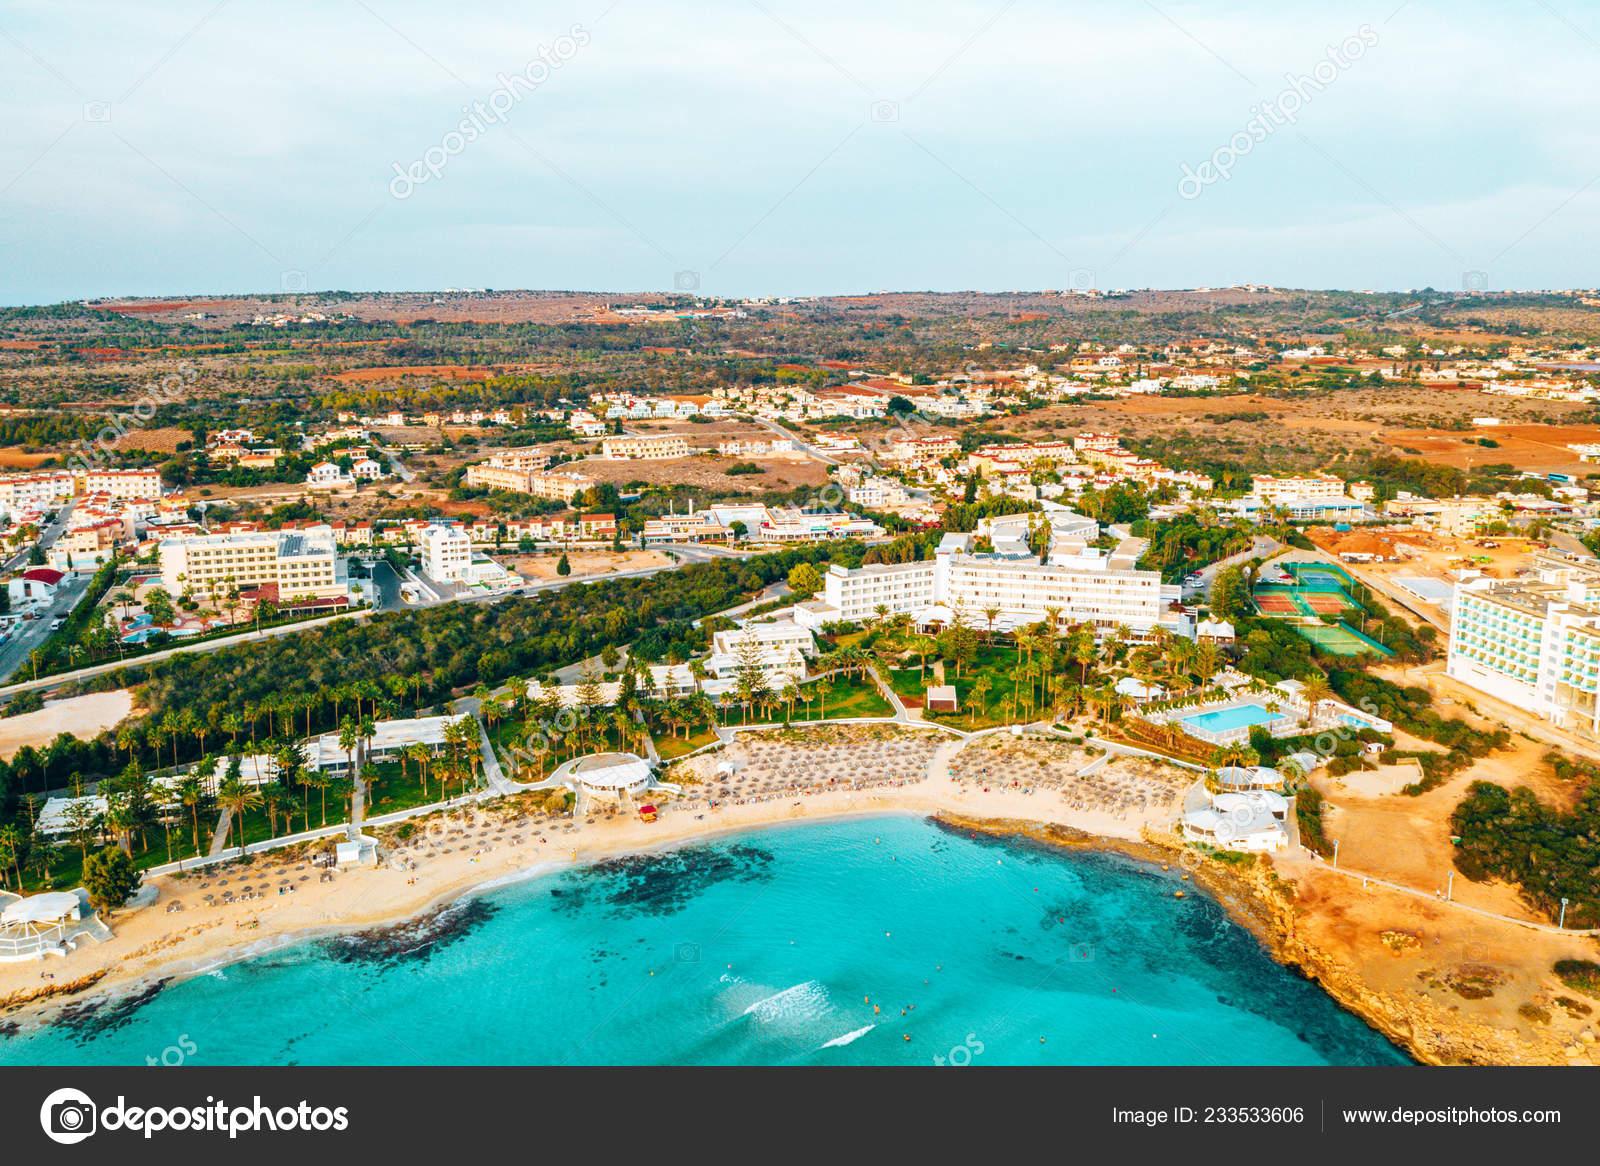 Nissi Beach Ayia Napa Clean Aerial Photo Famous Tourist